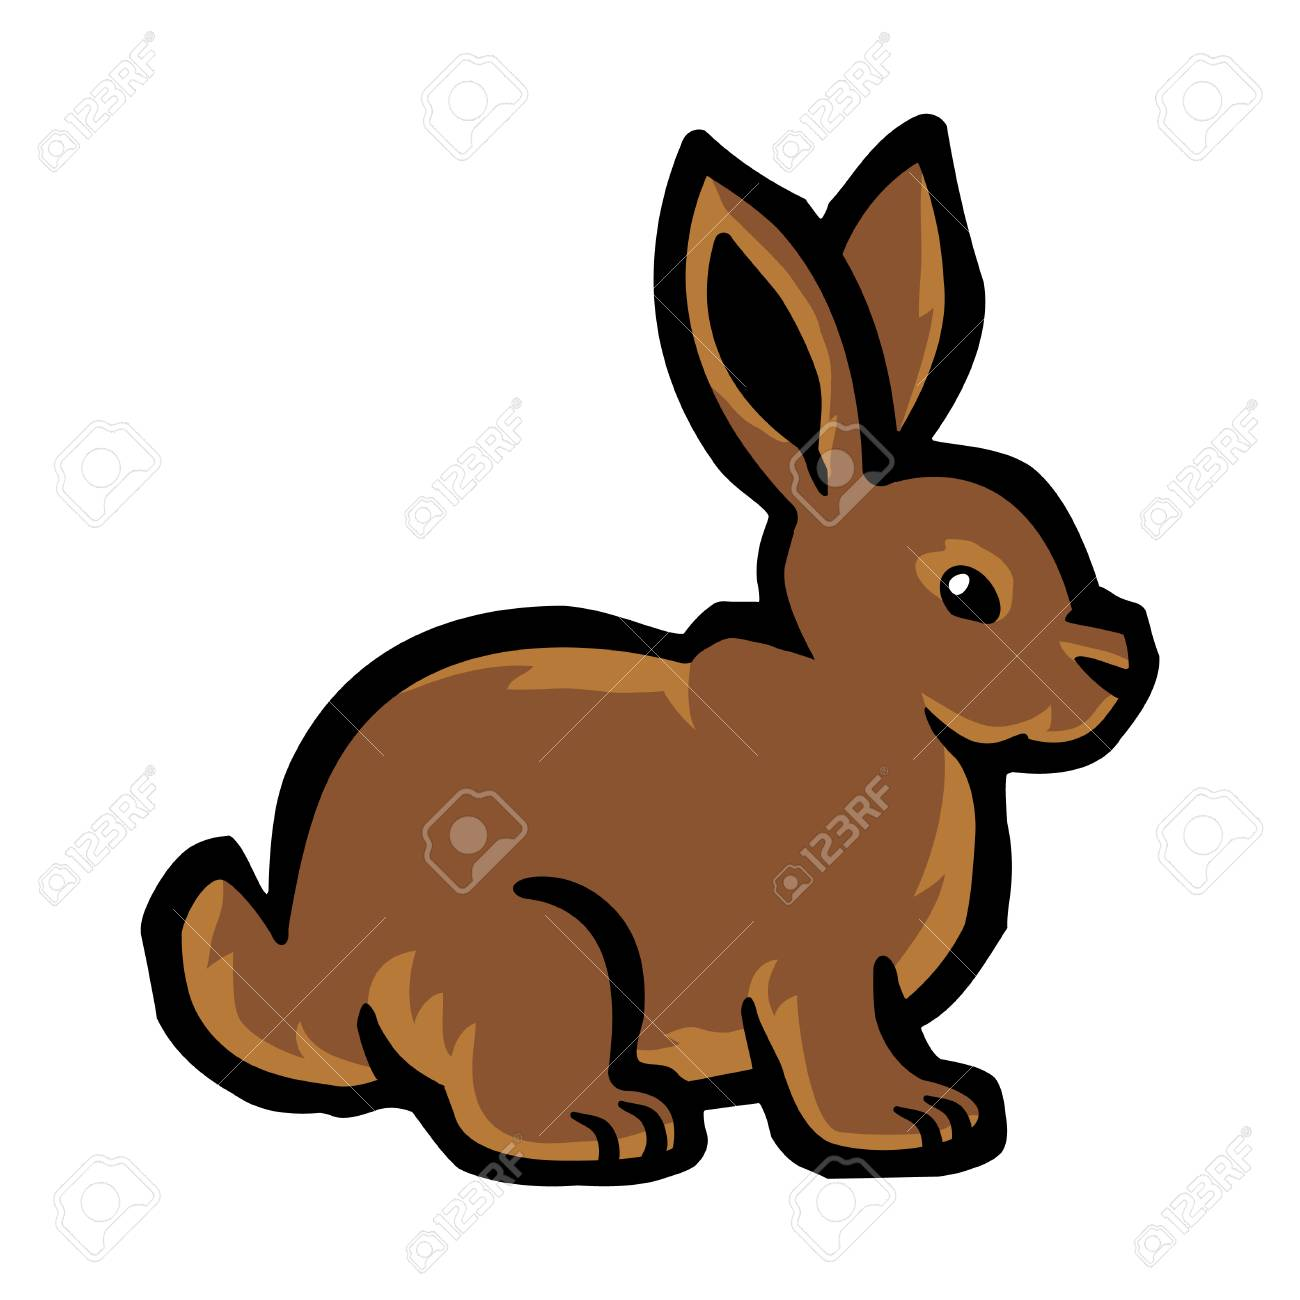 cartoon bunny rabbit vector royalty free cliparts vectors and rh 123rf com rabbit vector free download rabbit vector ai free download